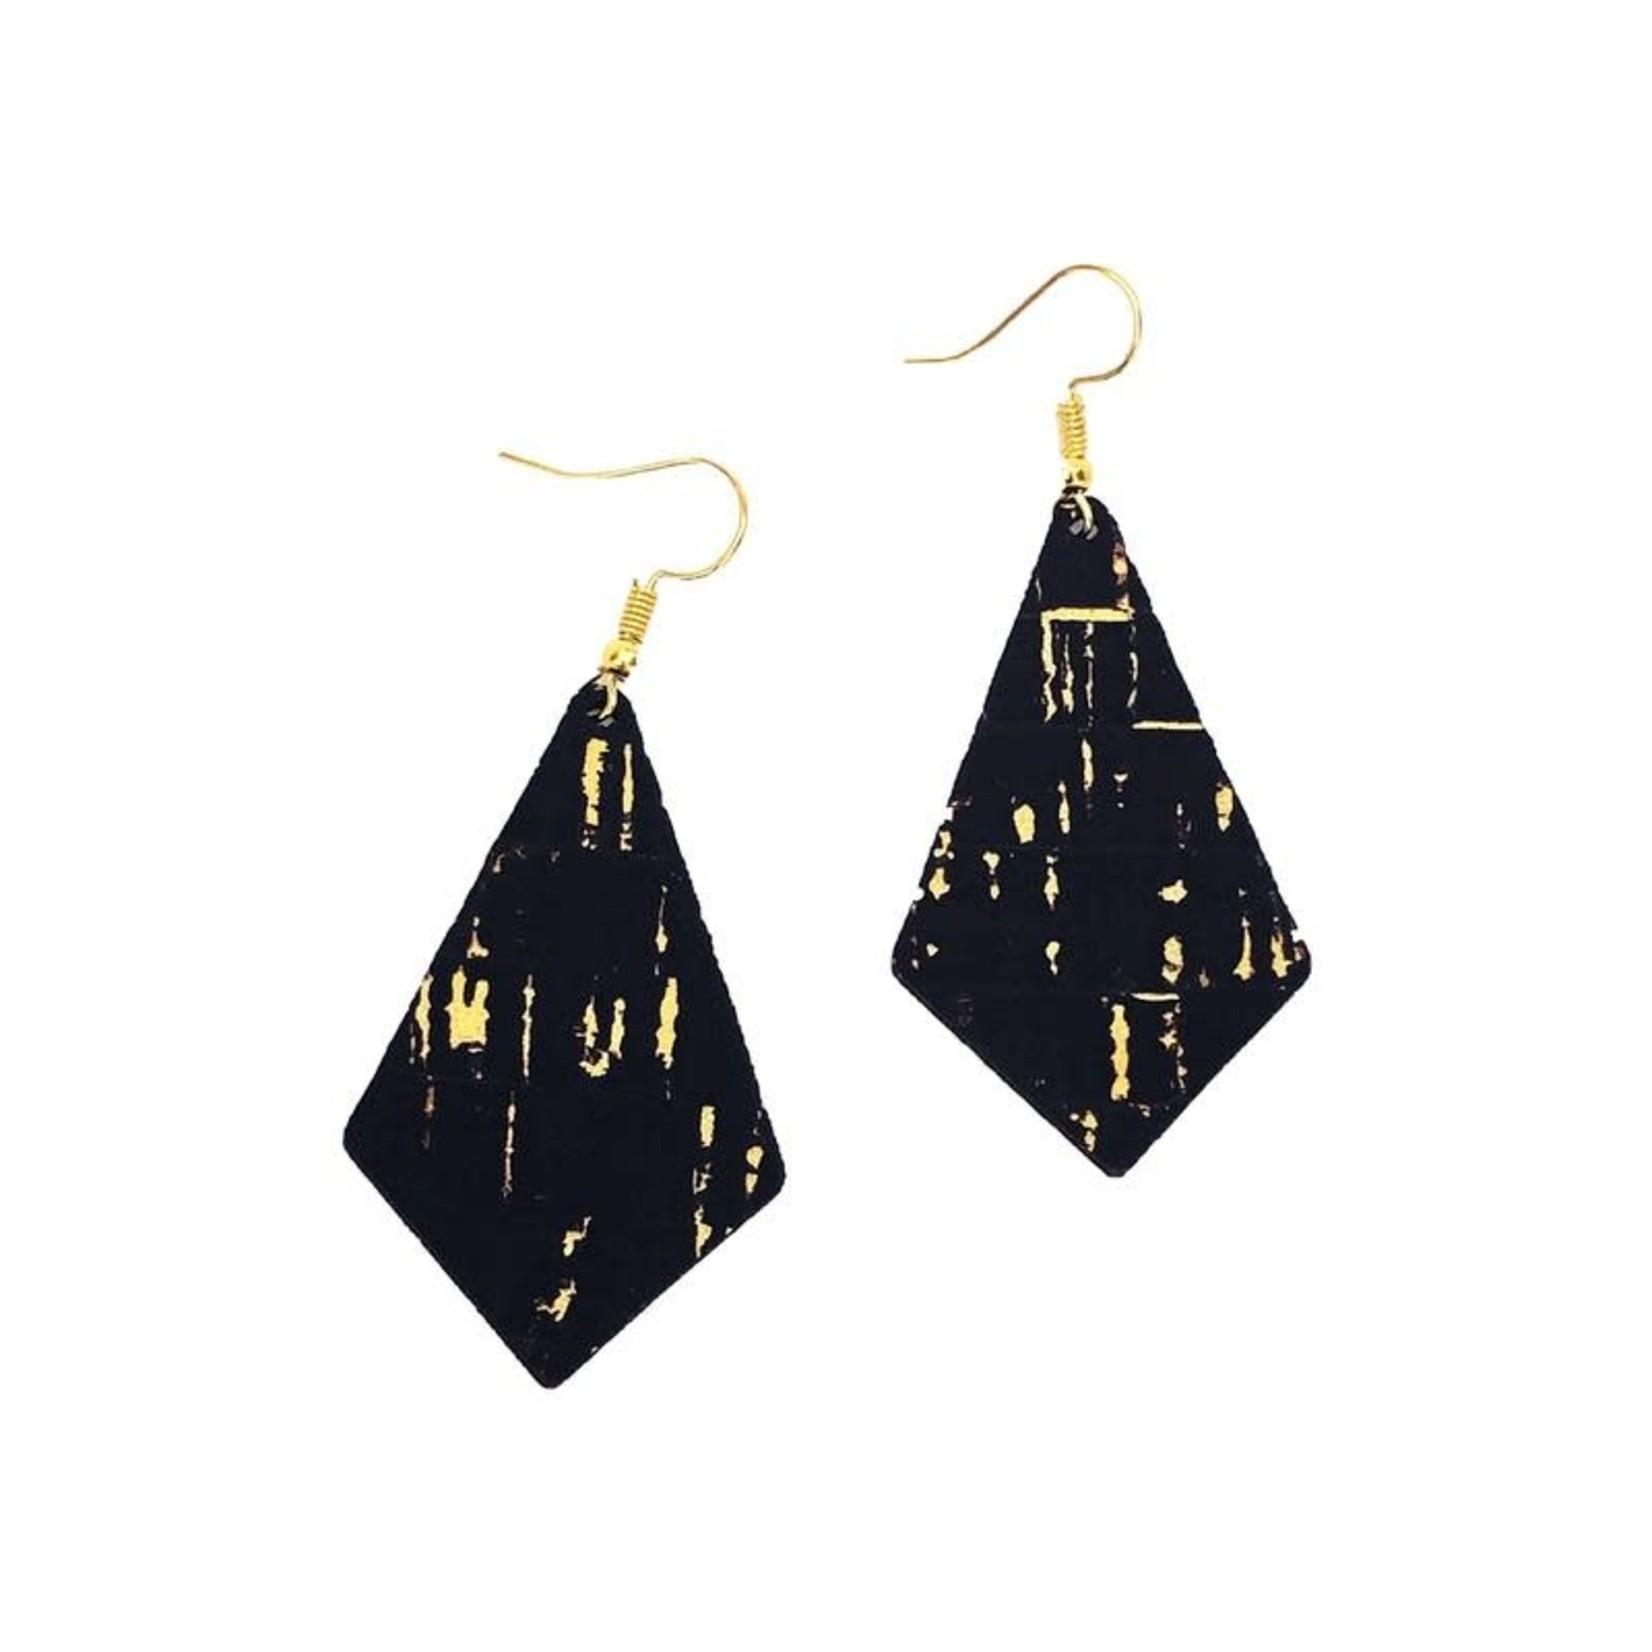 Queork Black and Gold Cork Geometric Earrings